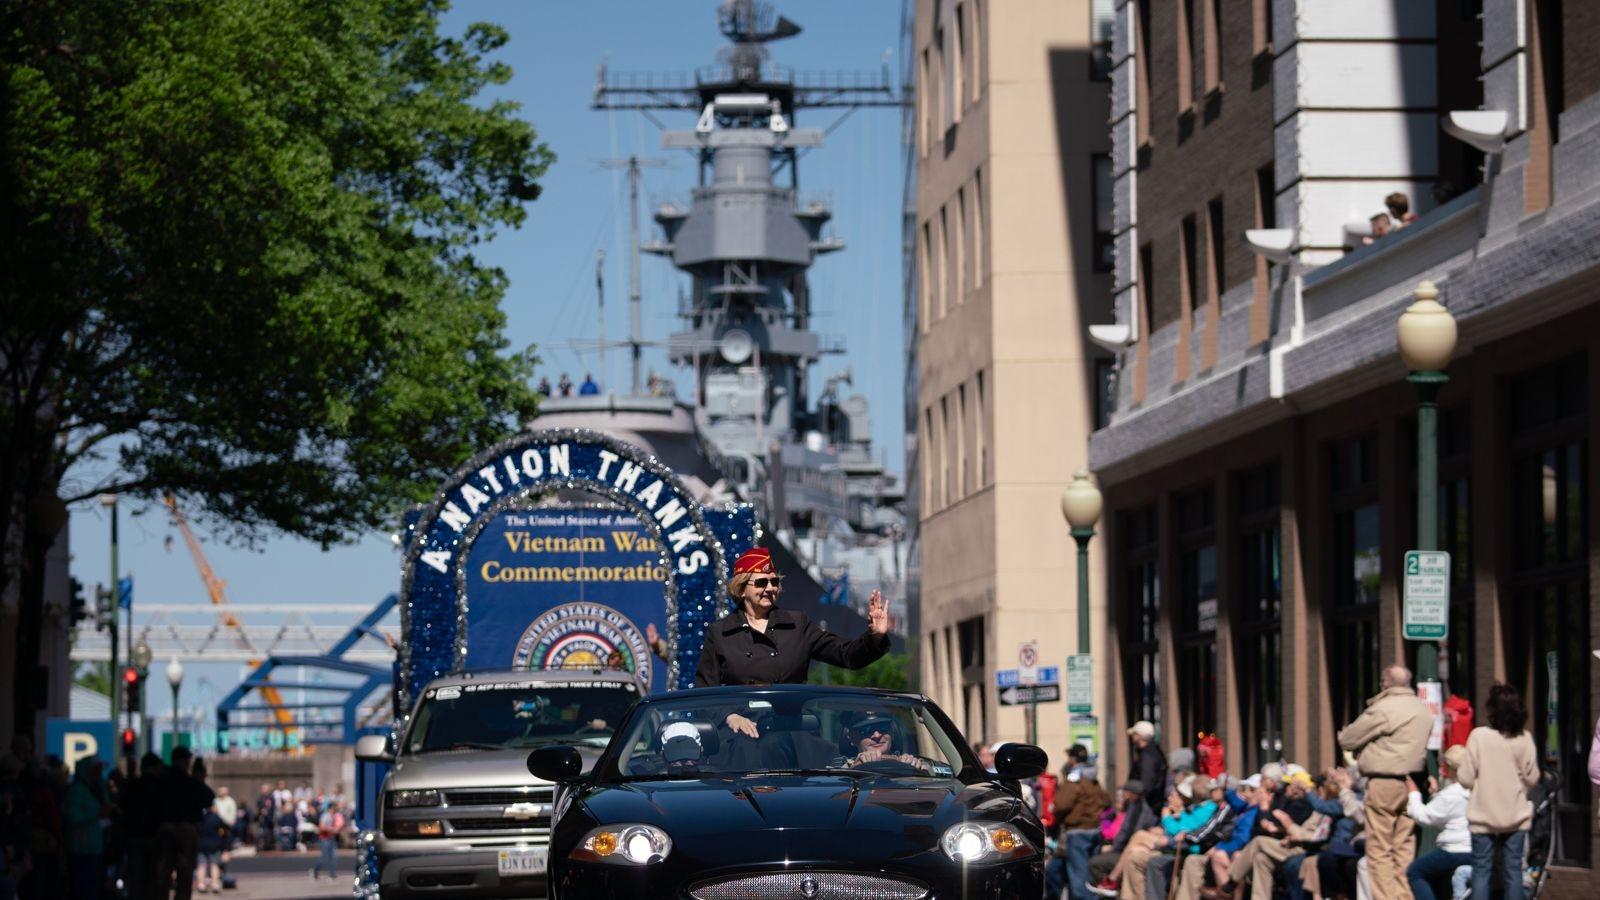 PNC Rohan among women veterans honored in Virginia